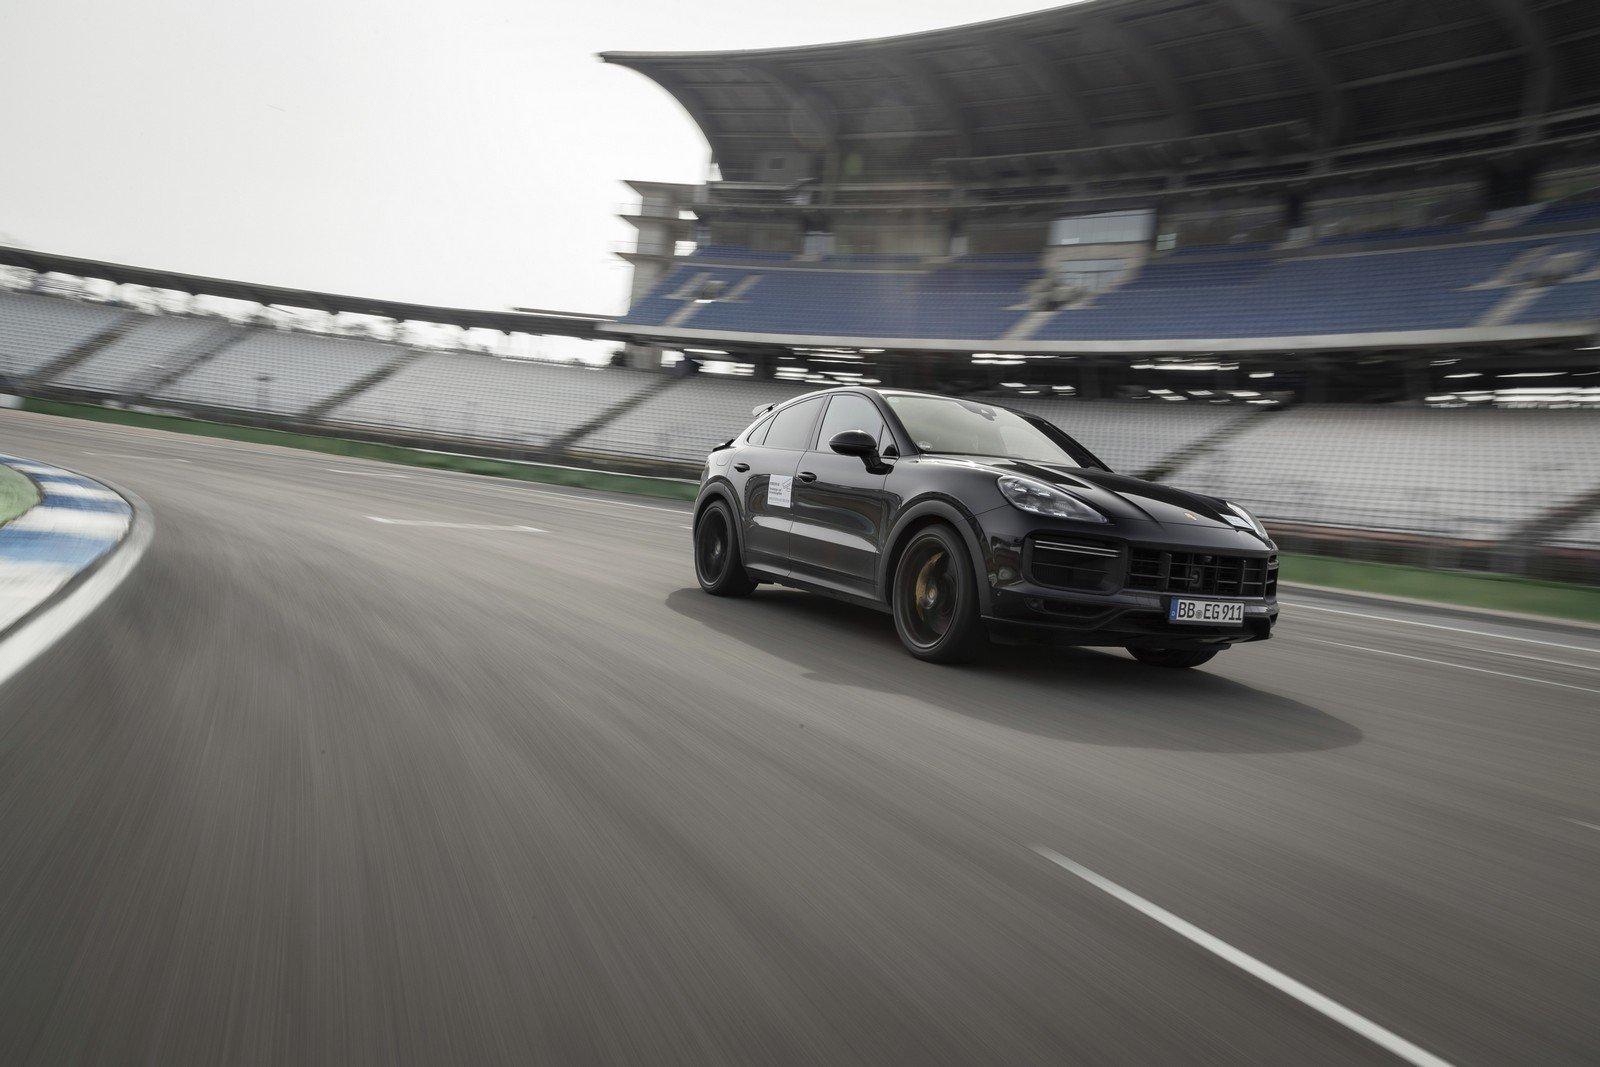 Porsche Cayenne Coupé: foto spia ufficiali del restyling